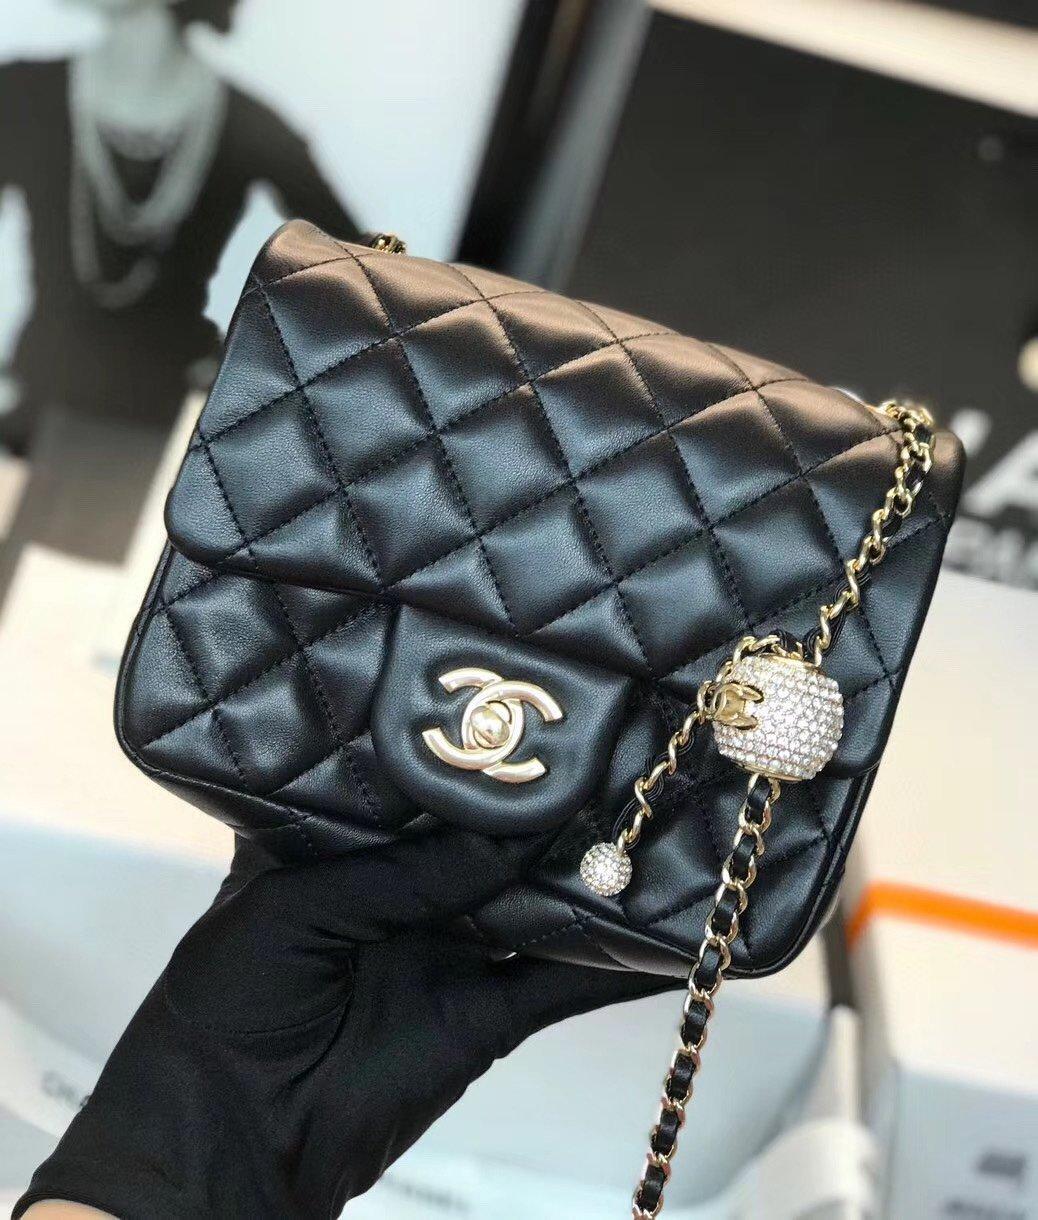 Chanel香奈儿专柜最新钻珠cf款(图1)